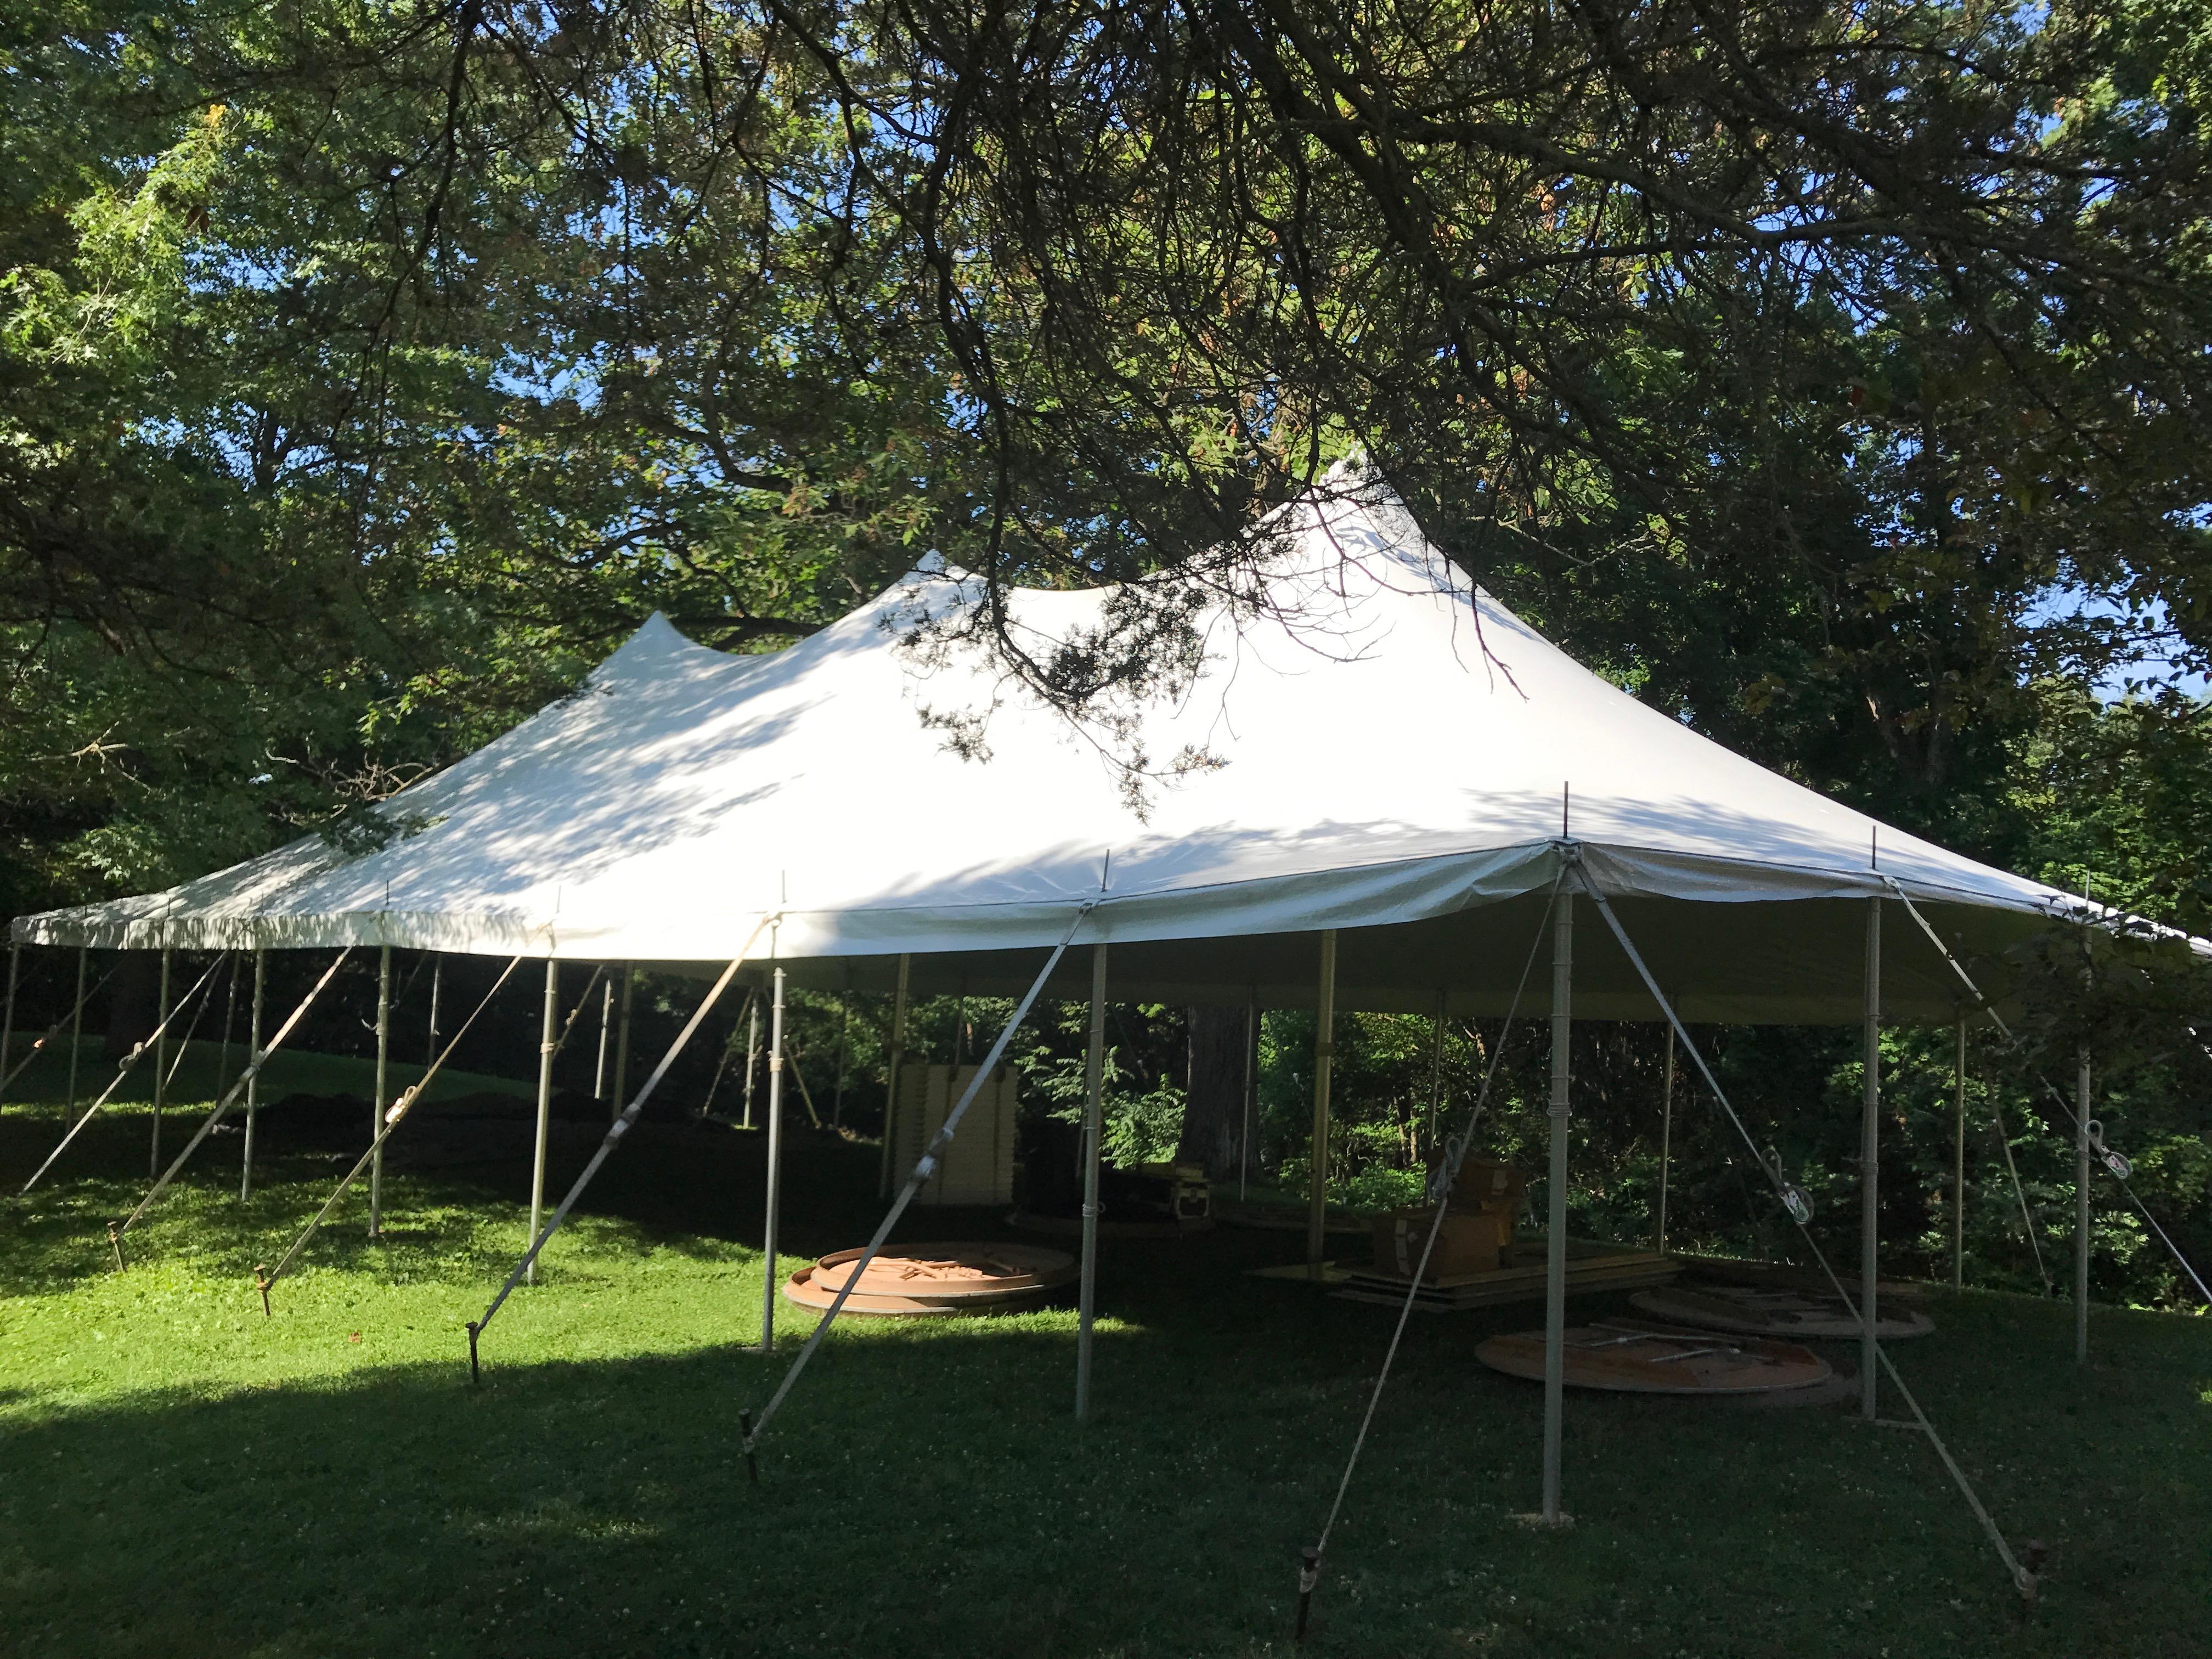 Corner of the 30u2032 x 60u2032 rope and pole wedding tent in Mount Vernon IA & Corner of the 30u0027 x 60u0027 rope and pole wedding tent in Mount Vernon ...